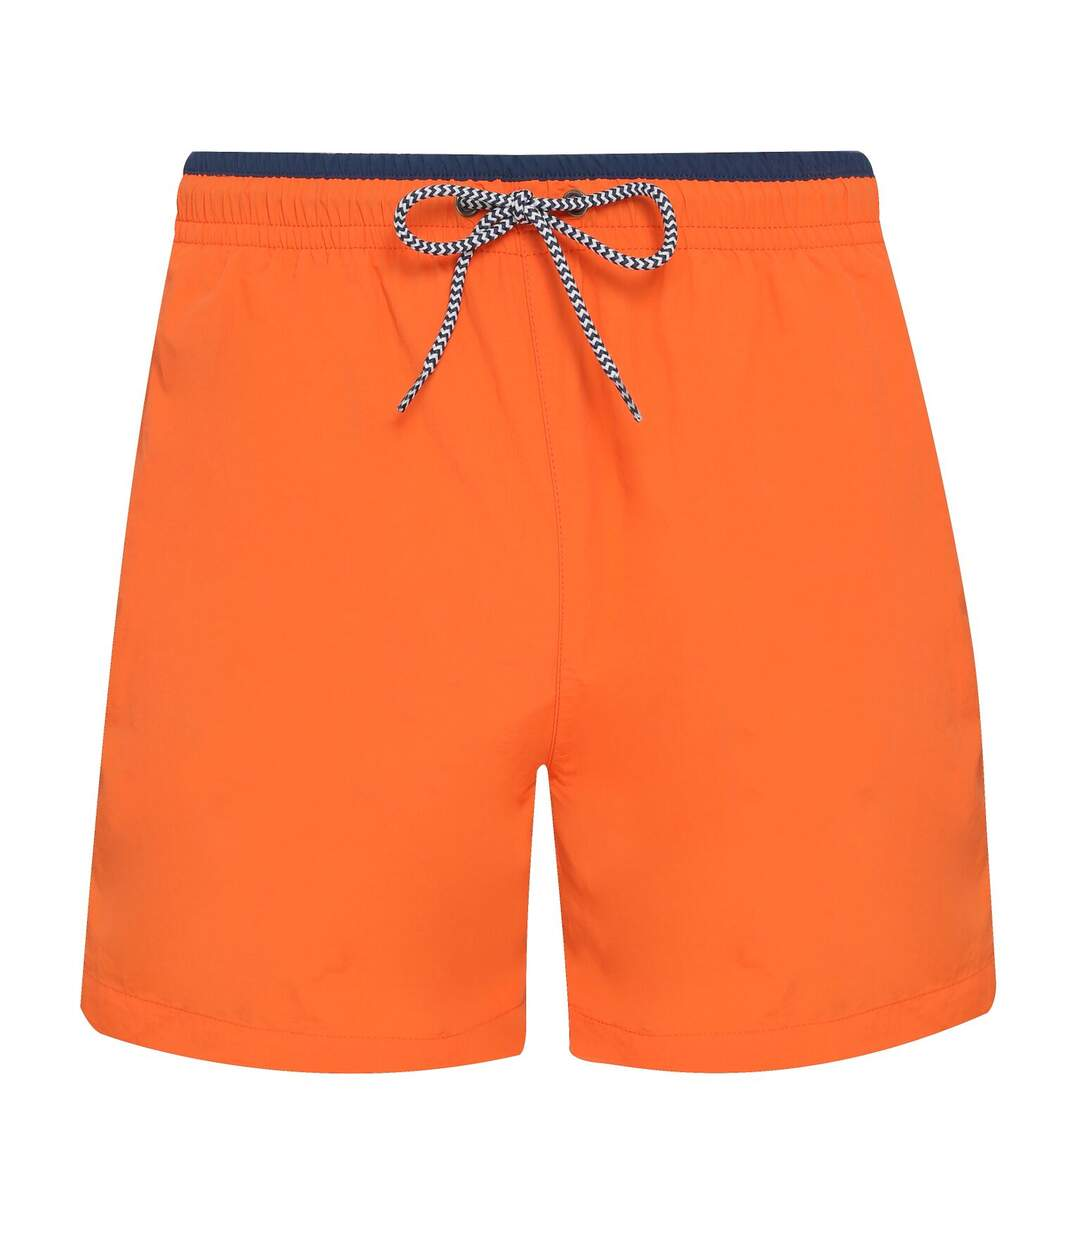 Asquith & Fox Mens Swim Shorts (Orange/Navy) - UTRW6242